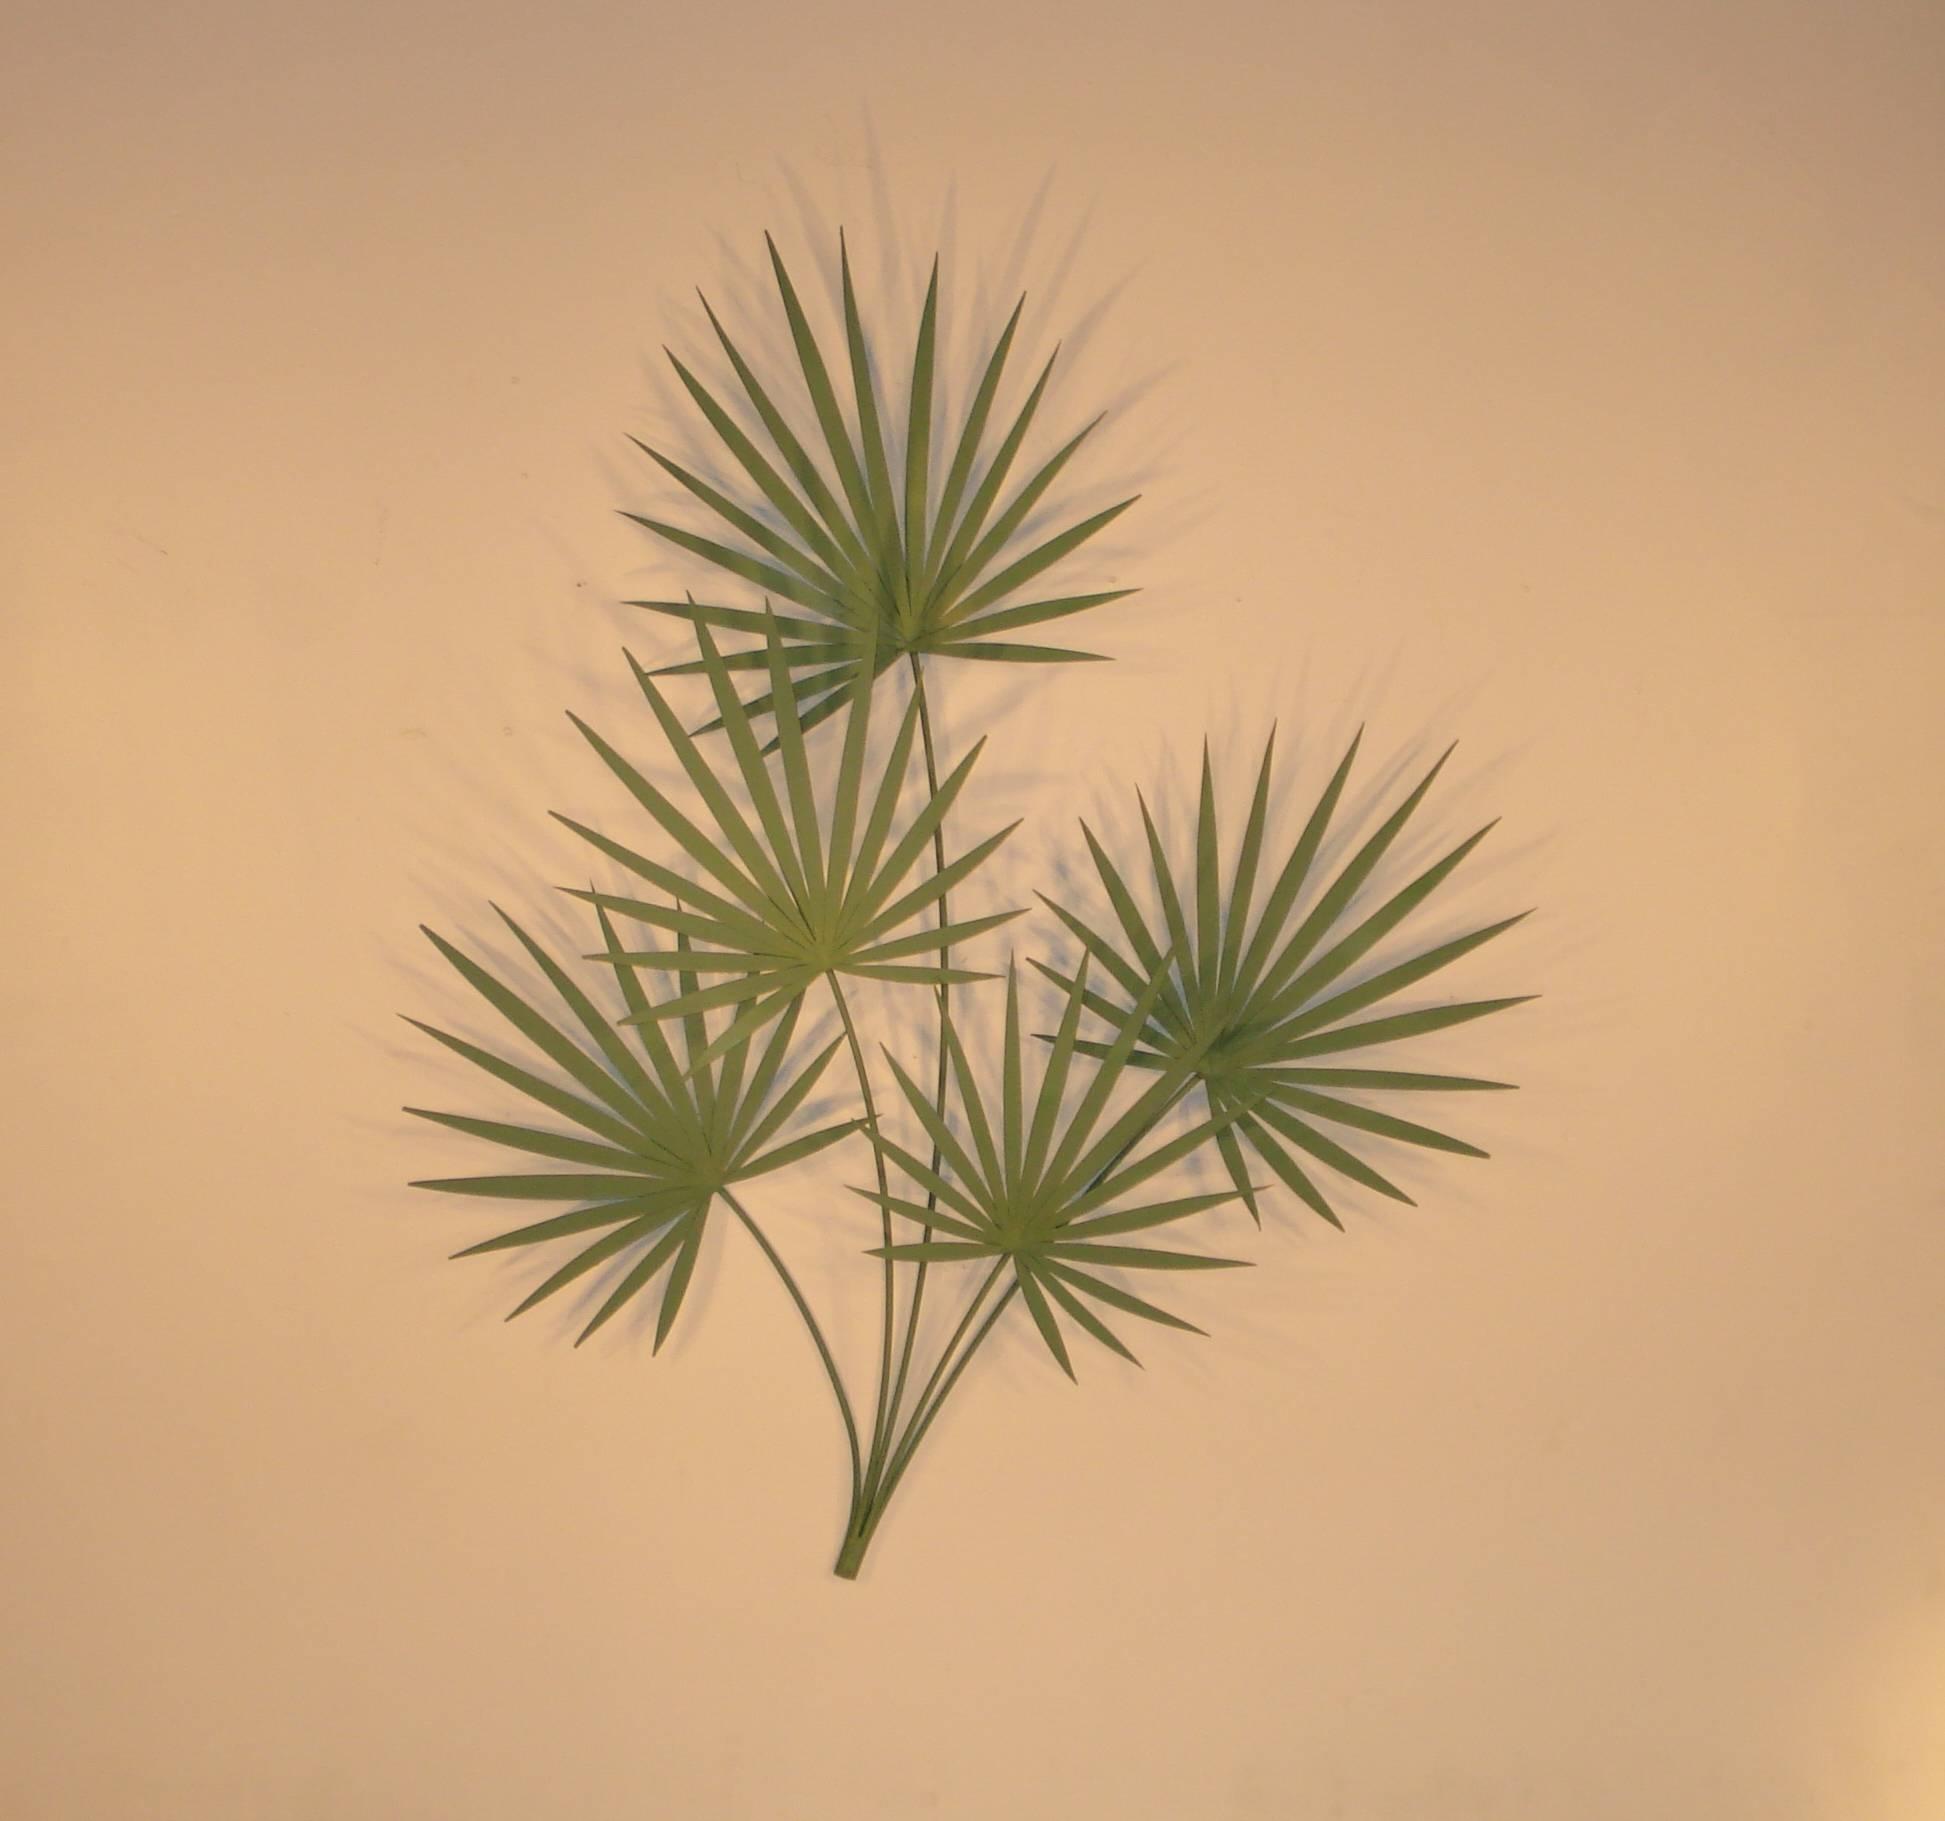 2018 Best of Palm Leaf Wall Decor